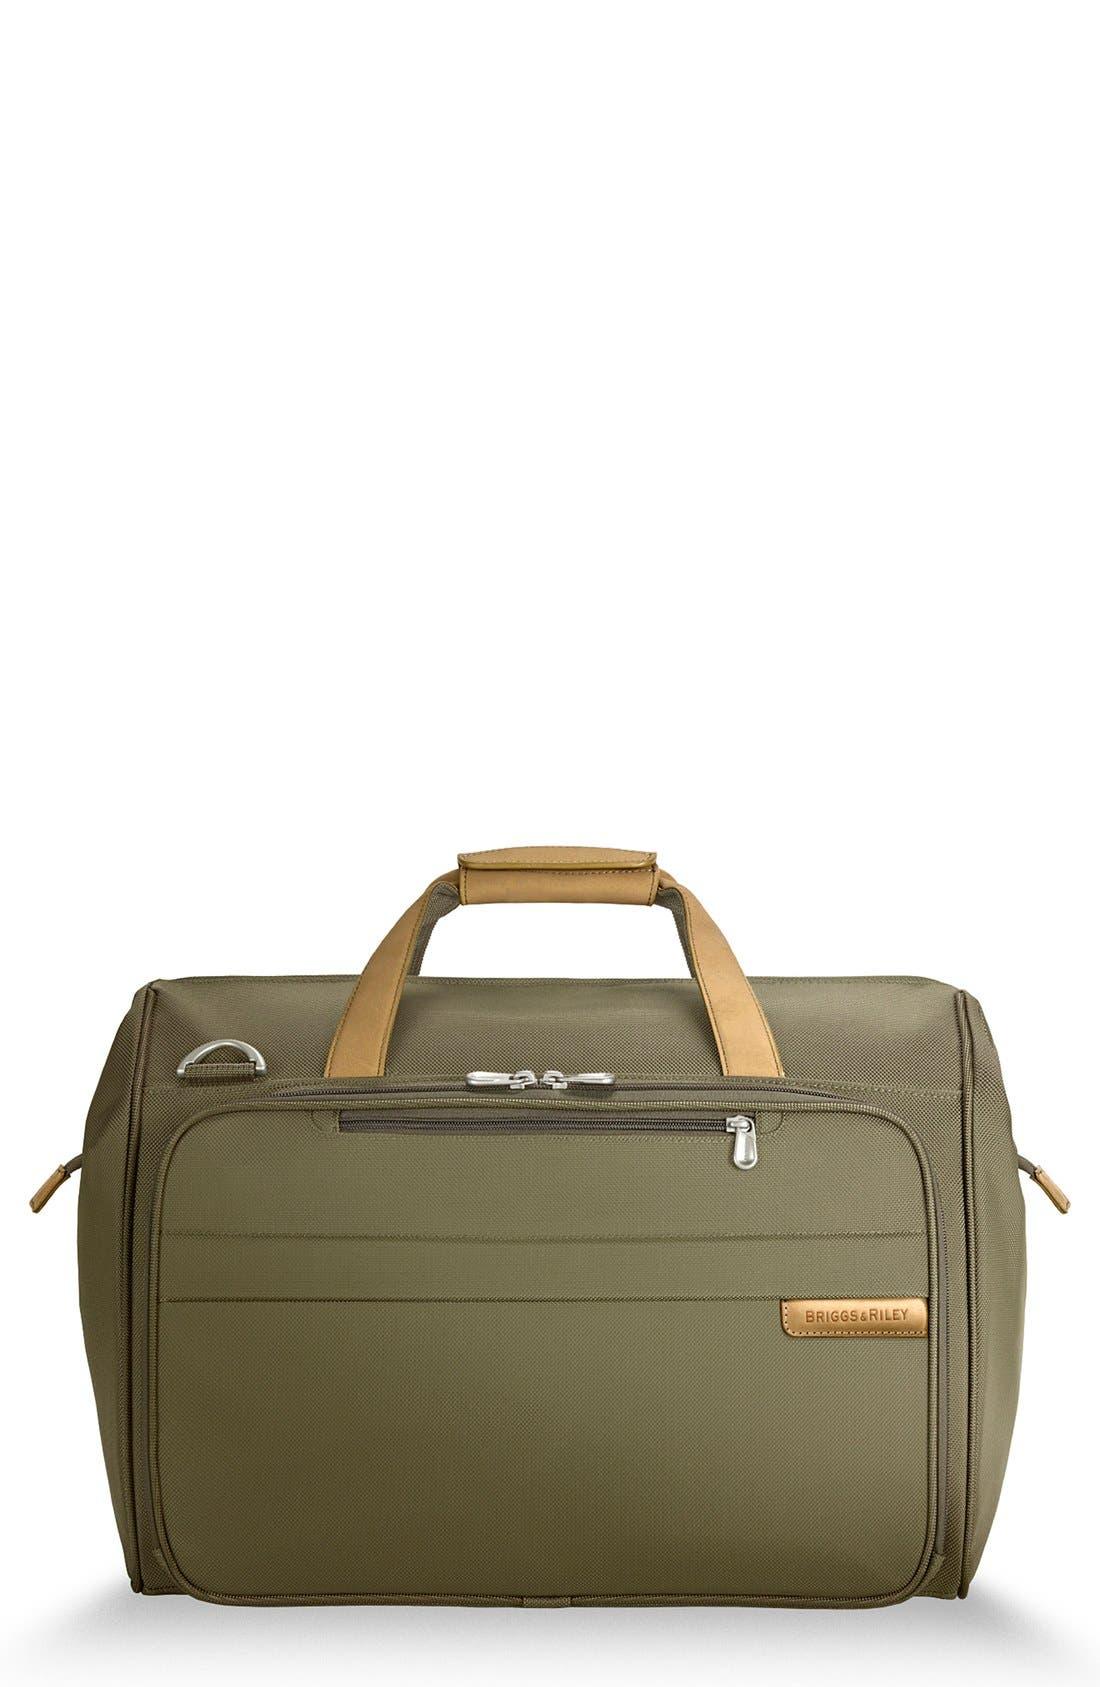 'Baseline' Duffel Bag,                             Main thumbnail 1, color,                             Olive Green